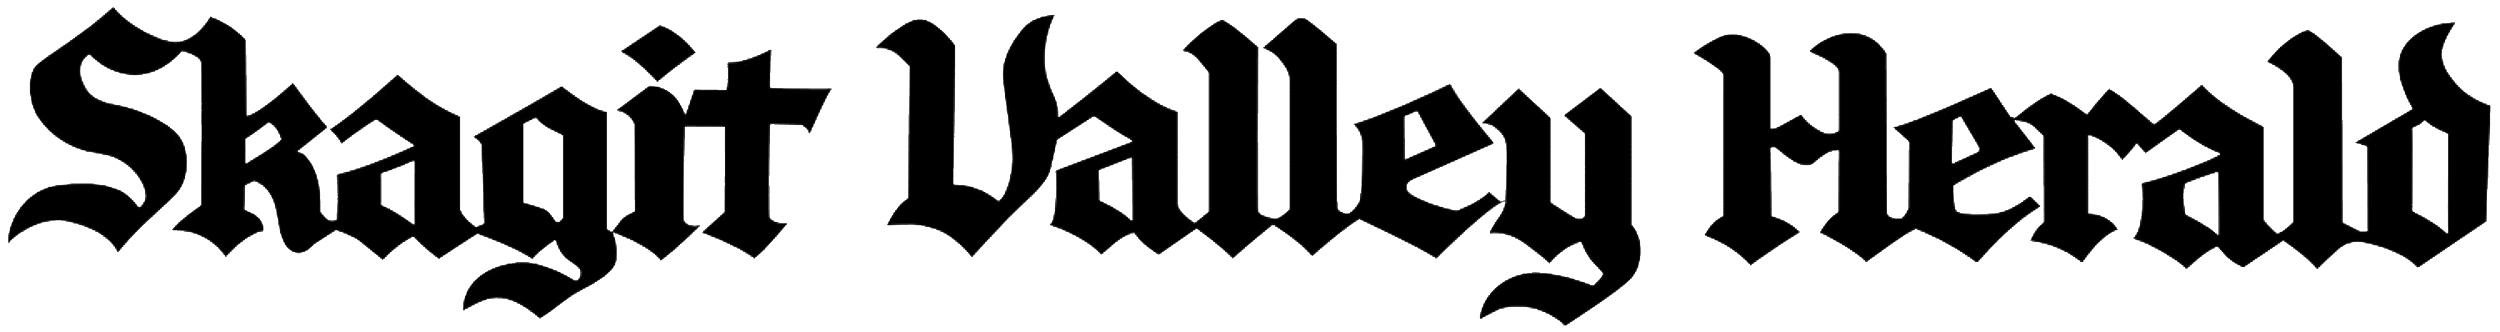 Skagit_Valley_Herald_logo_black.png